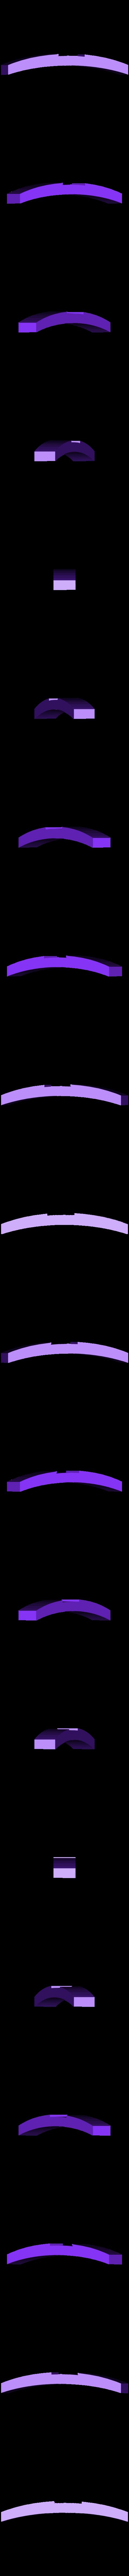 platform_cradle_rear.stl Download free STL file Gowanus Monster - Margo Series • 3D printable object, boldmachines